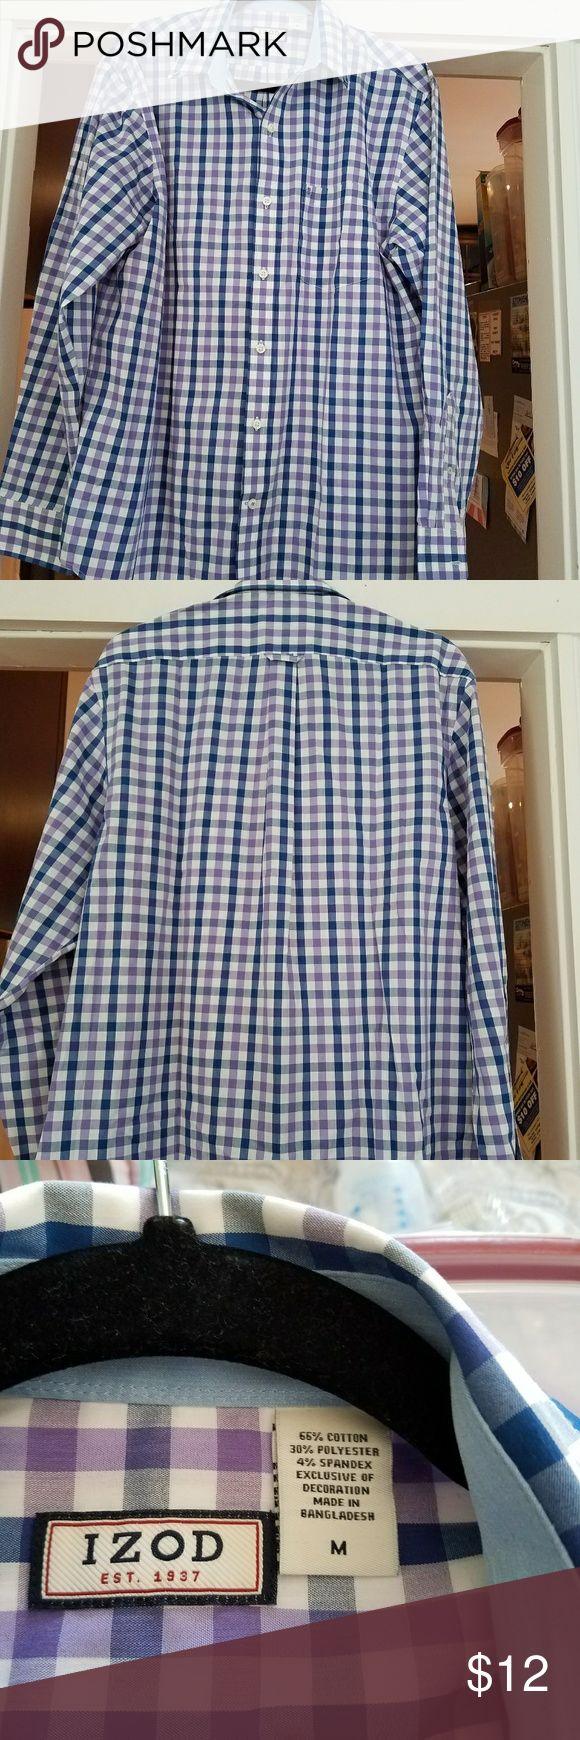 Izod multi colored checkered dress shirt Mens dress shirt is NWOT and multi colored checkered. Shirts Dress Shirts